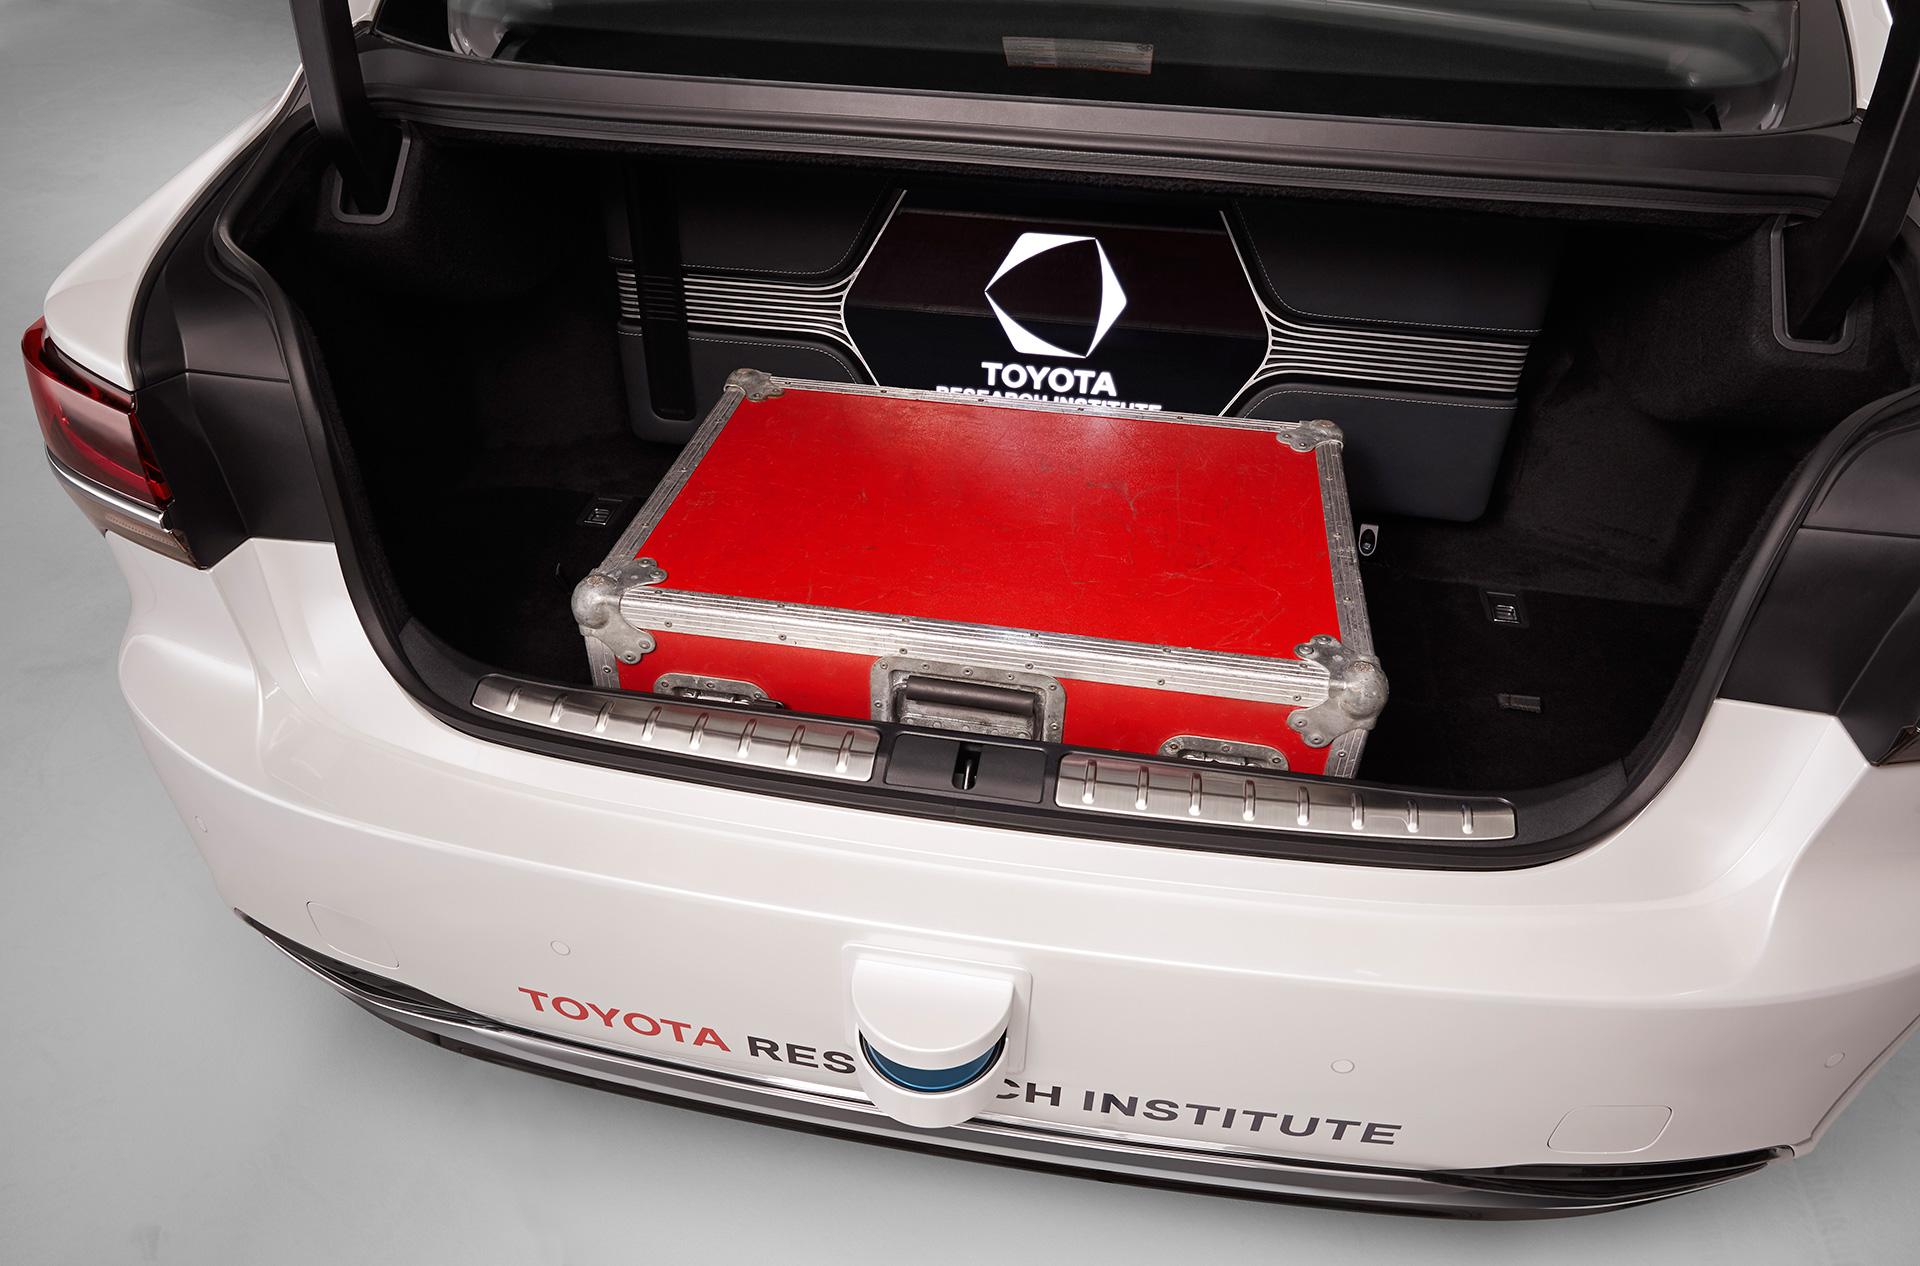 「【CES 2019】新型レクサスLSをベースとした自動運転実験車「TRI-P4」を披露」の1枚目の画像